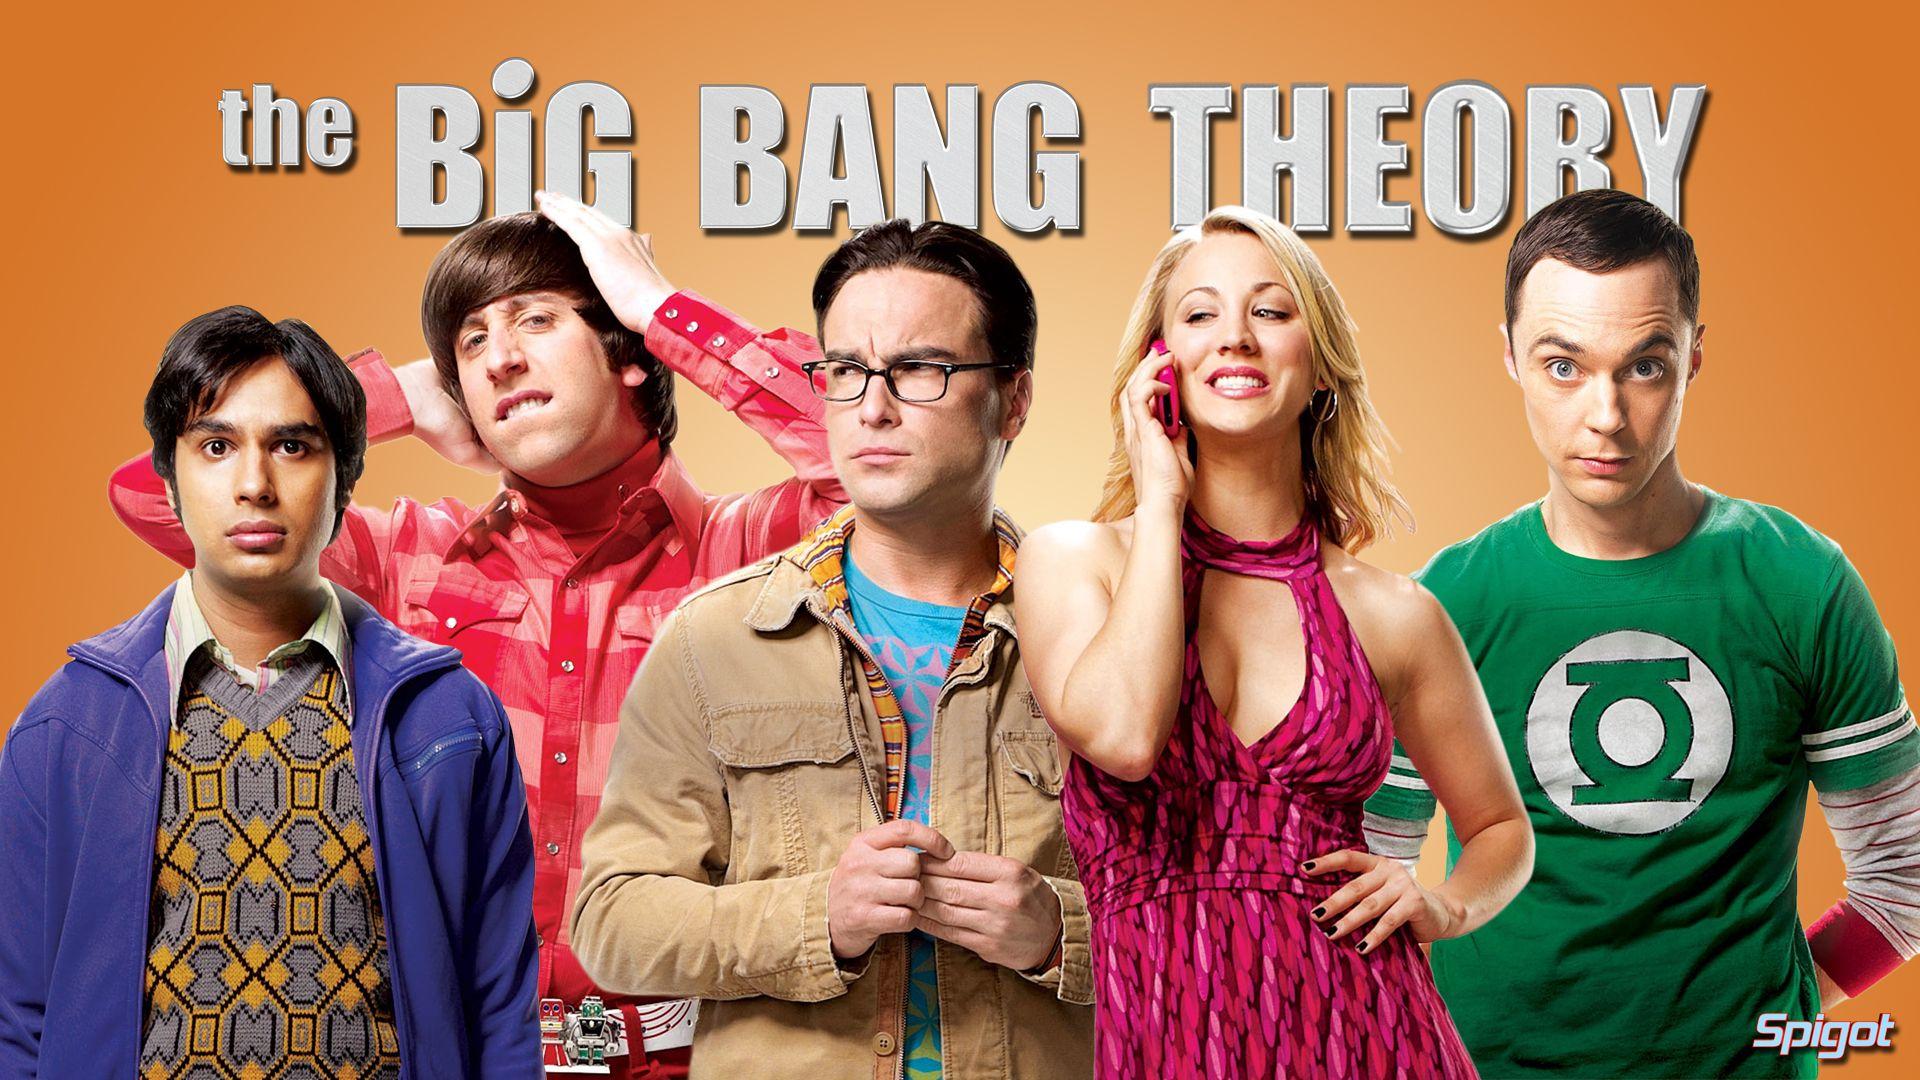 Funny big bang theory pictures 27 pics -  The Big Bang Theory And Brand Spokespeople